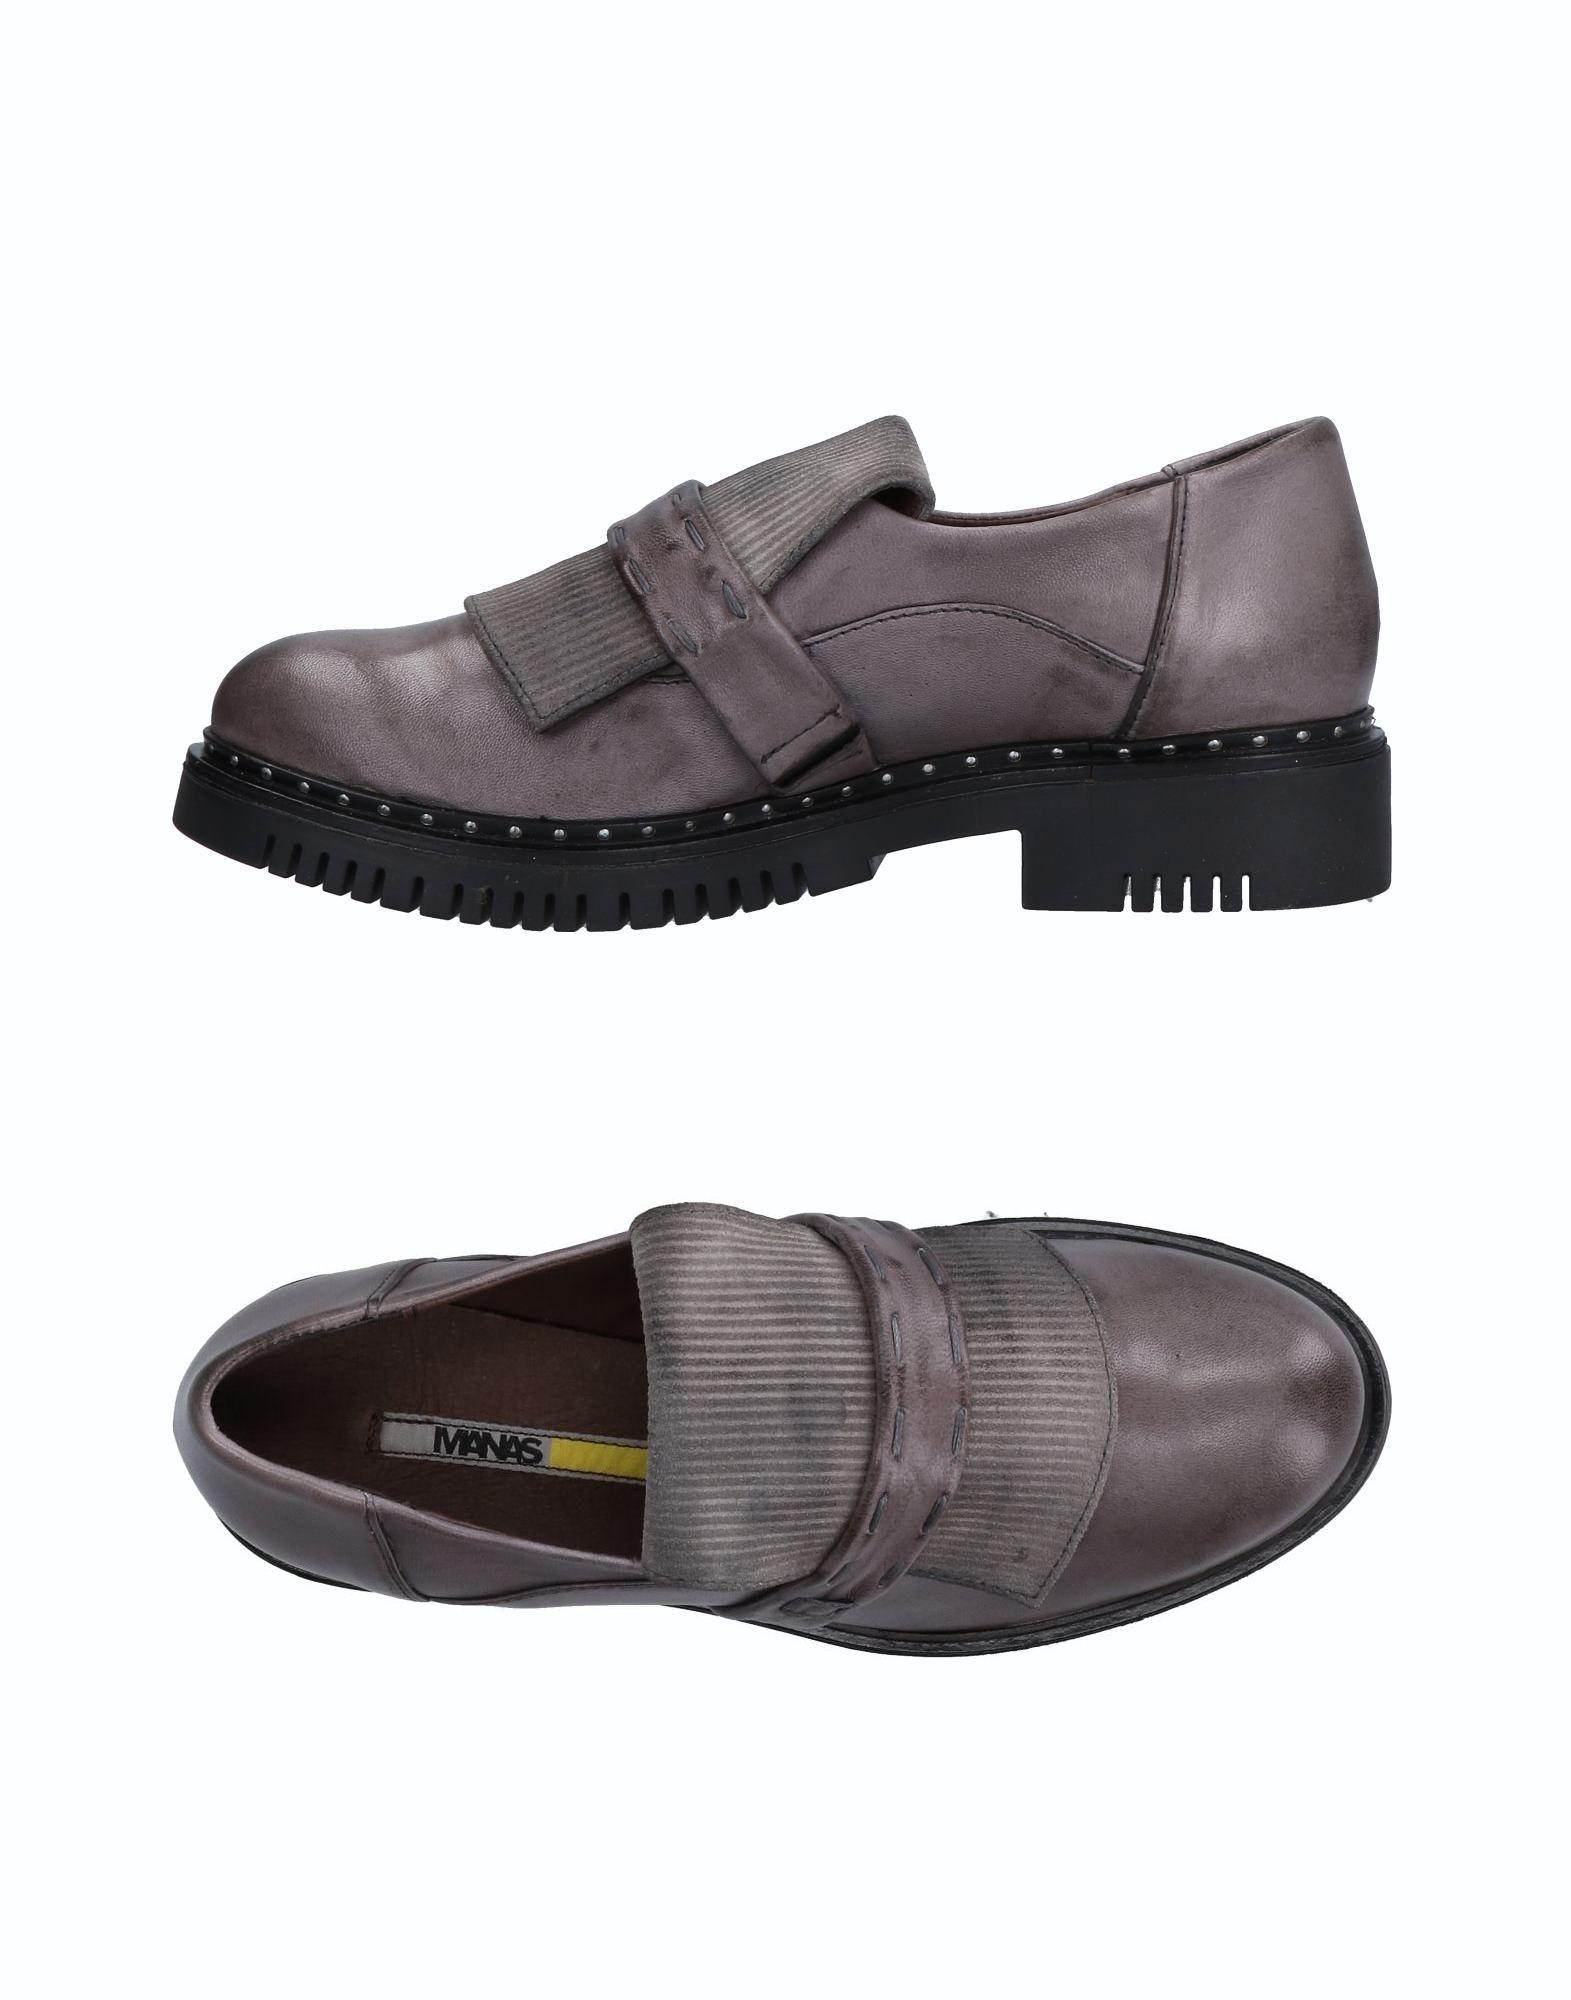 Manas Mokassins Damen  11513009TJ Gute Qualität beliebte Schuhe